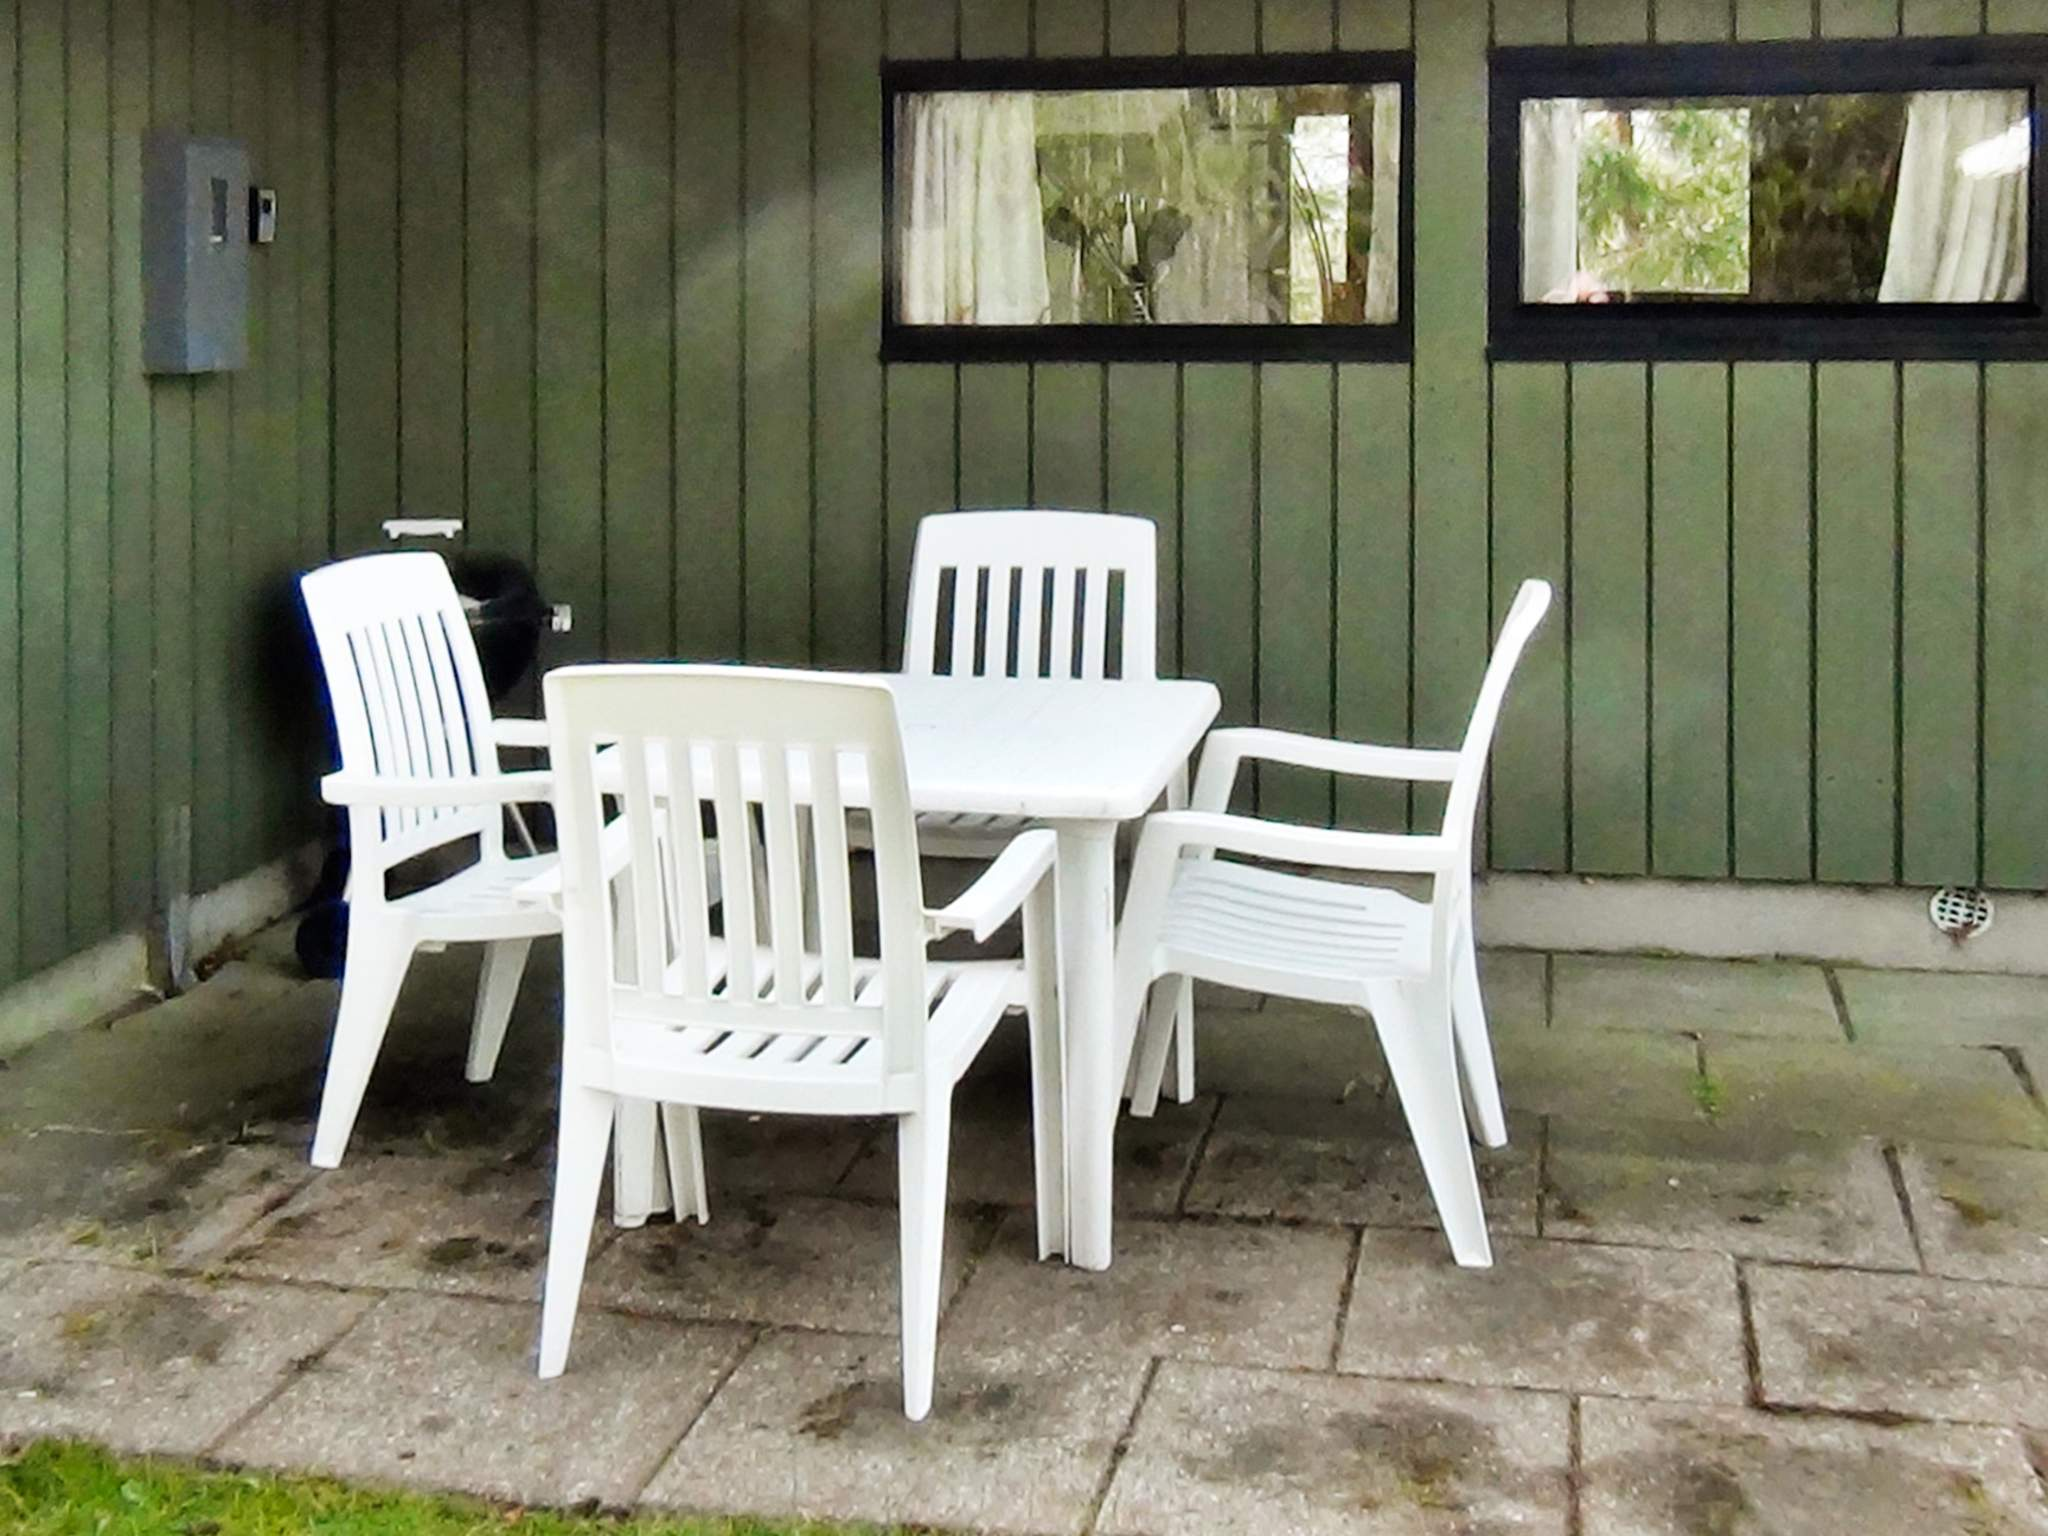 Maison de vacances Hyllingeriis (86362), Skibby, , Seeland Nord, Danemark, image 12